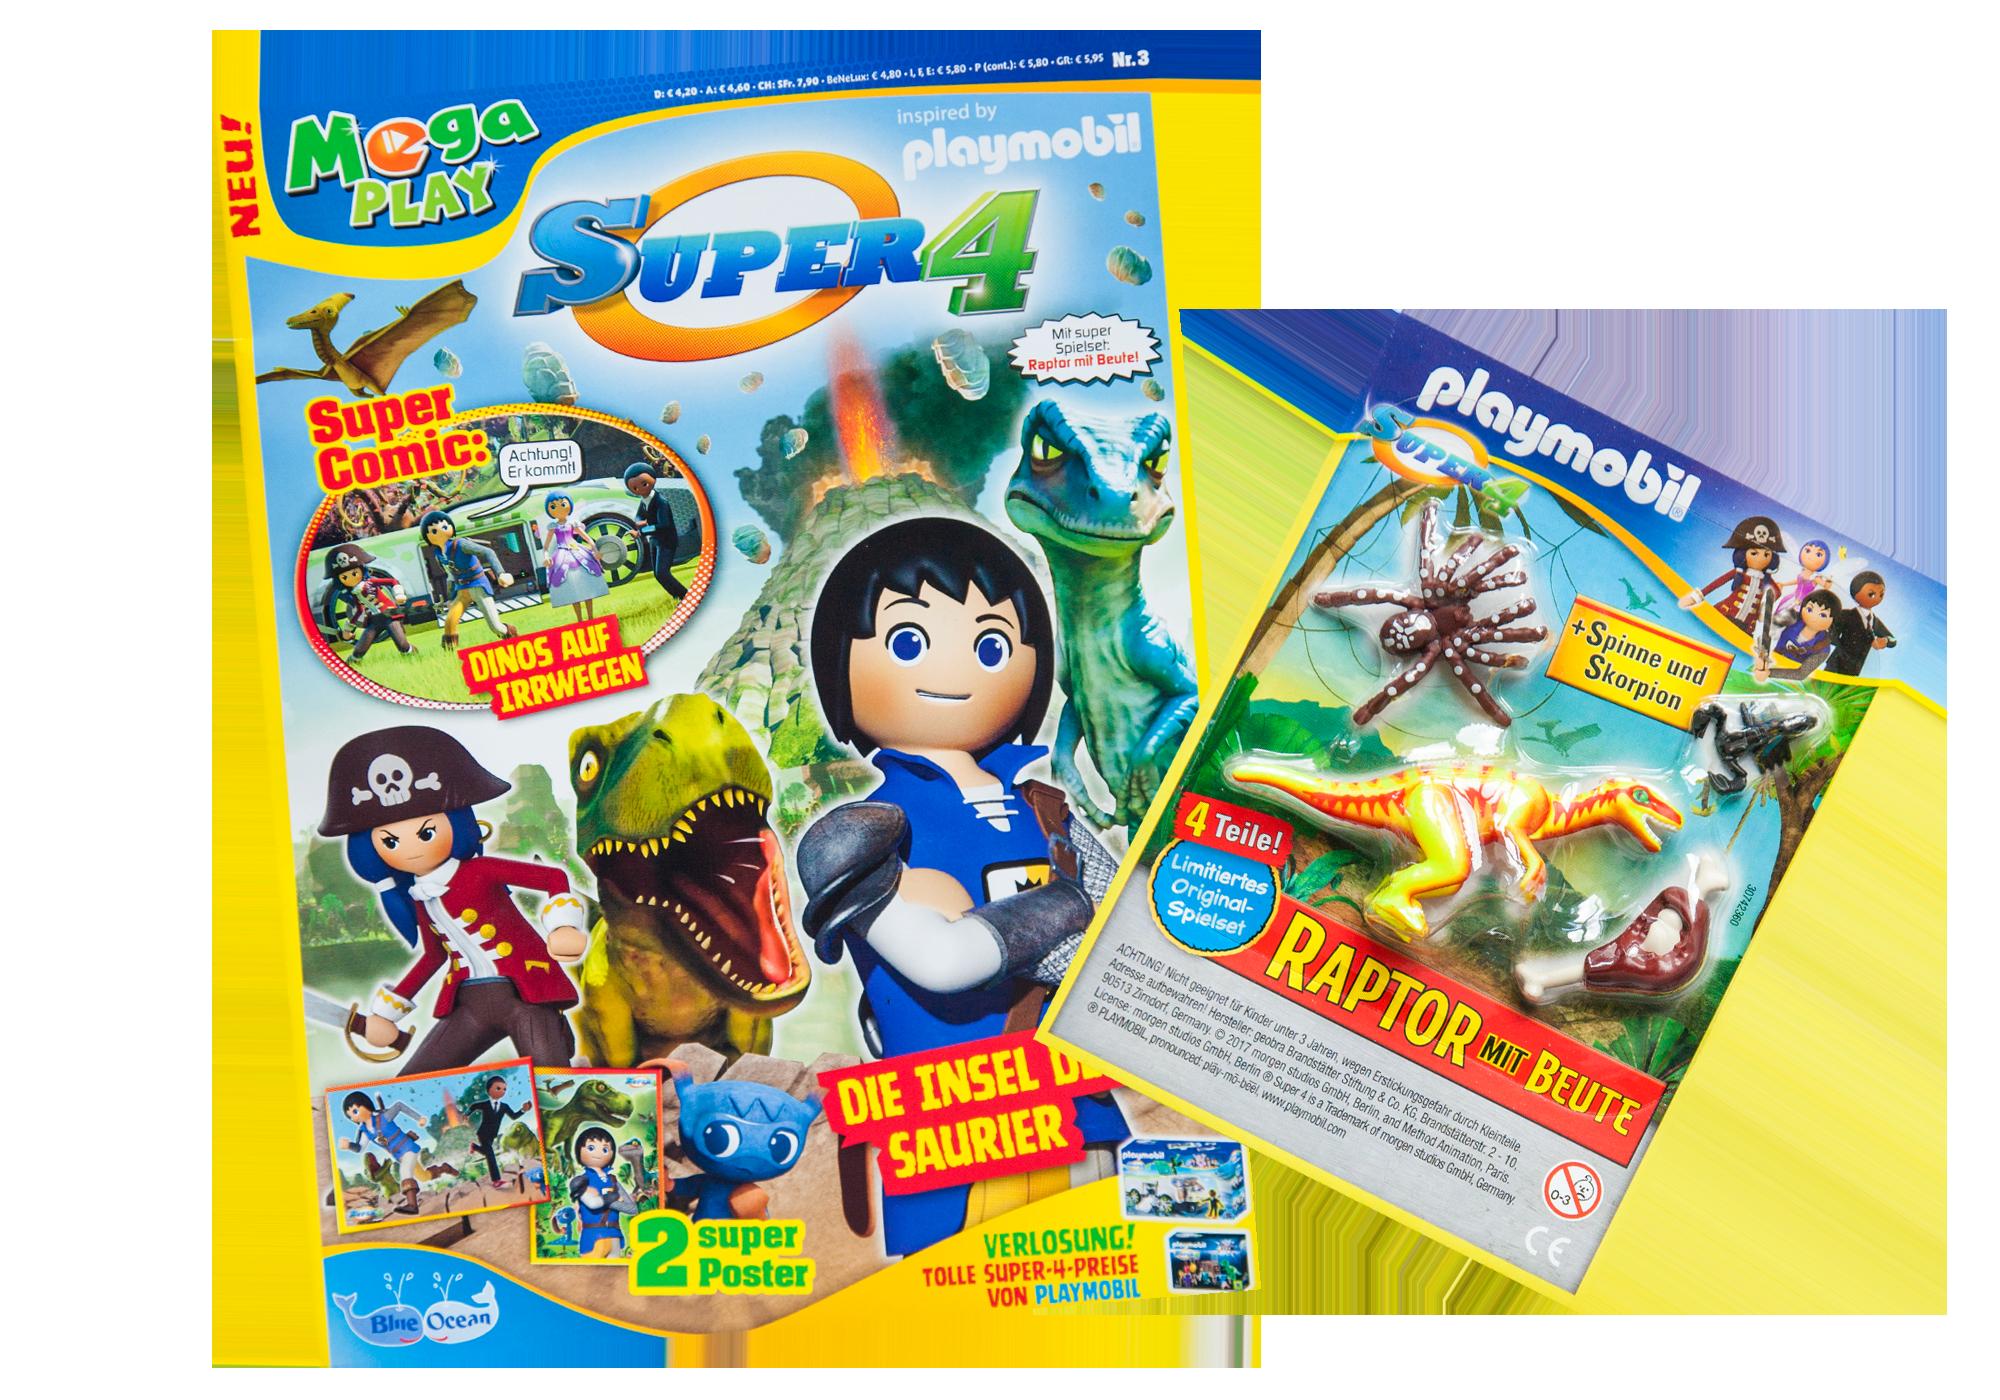 http://media.playmobil.com/i/playmobil/80809_product_detail/Super 4-Magazin 03/2017 (Heft 10)